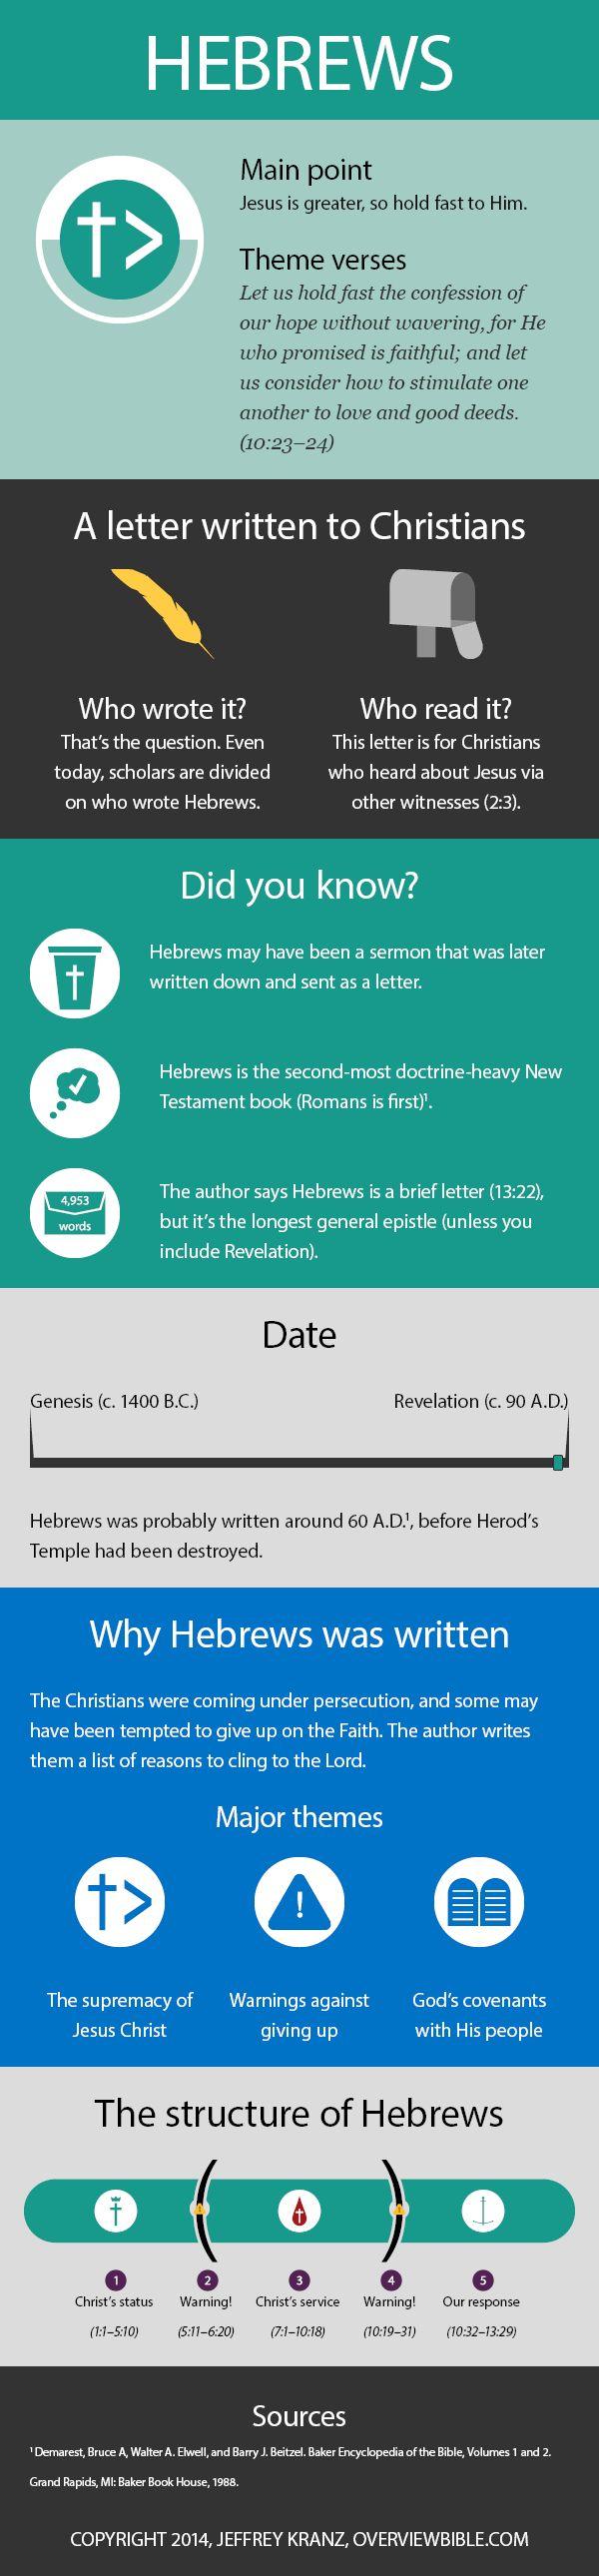 Hebrews-epistle-infographic-structure